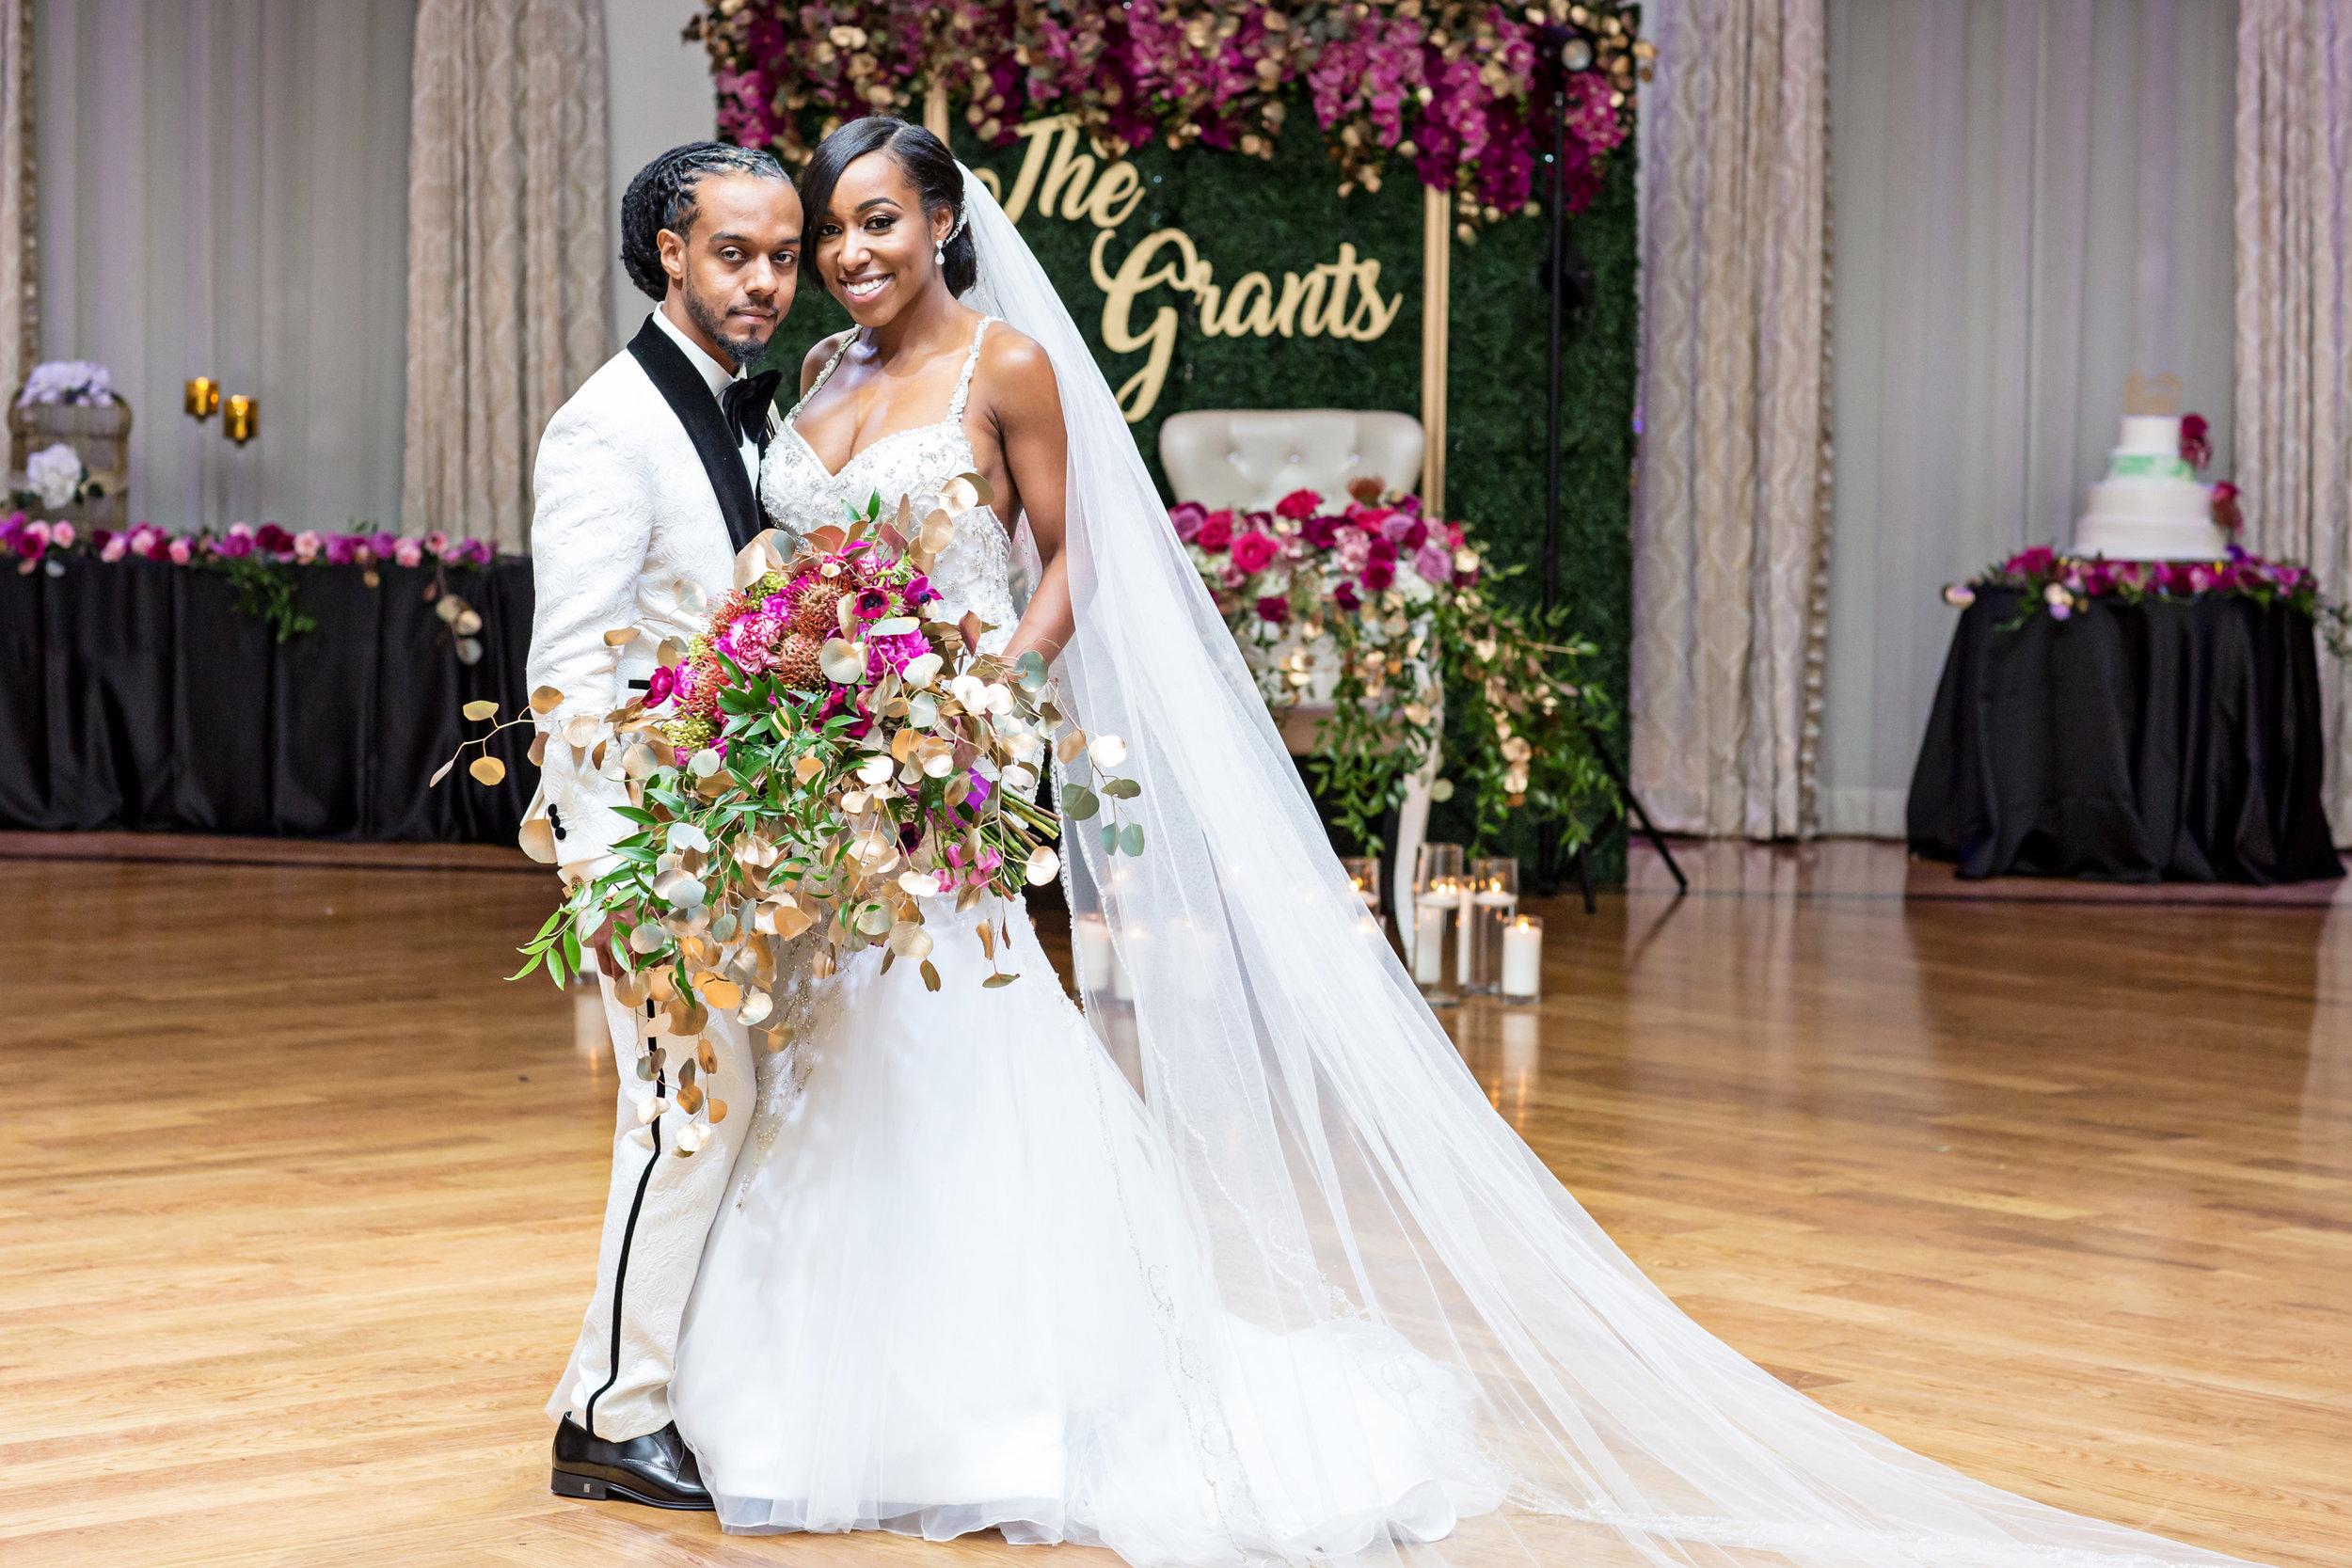 victorious-events-nyc-001-romie-kamali-tides-estate-wedding-nana-annan.jpg